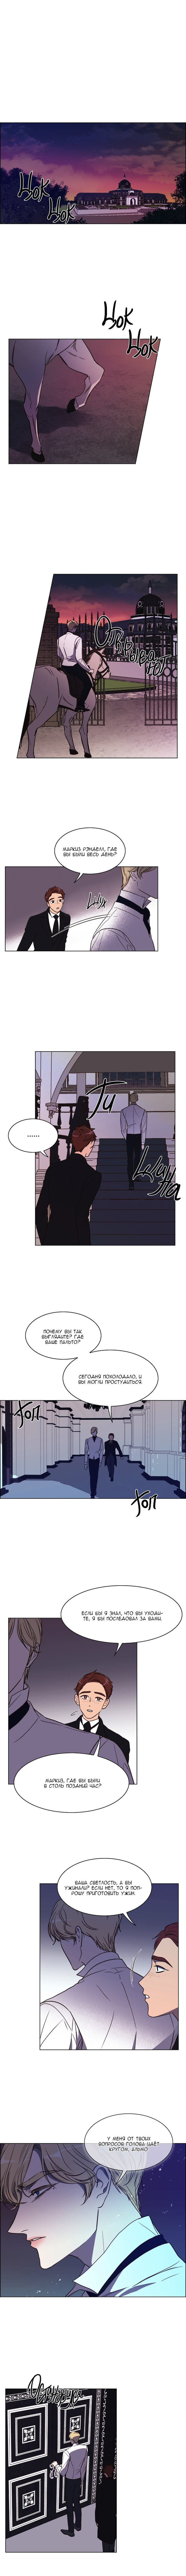 Манга Спасительница злодея - Глава 7 Страница 1